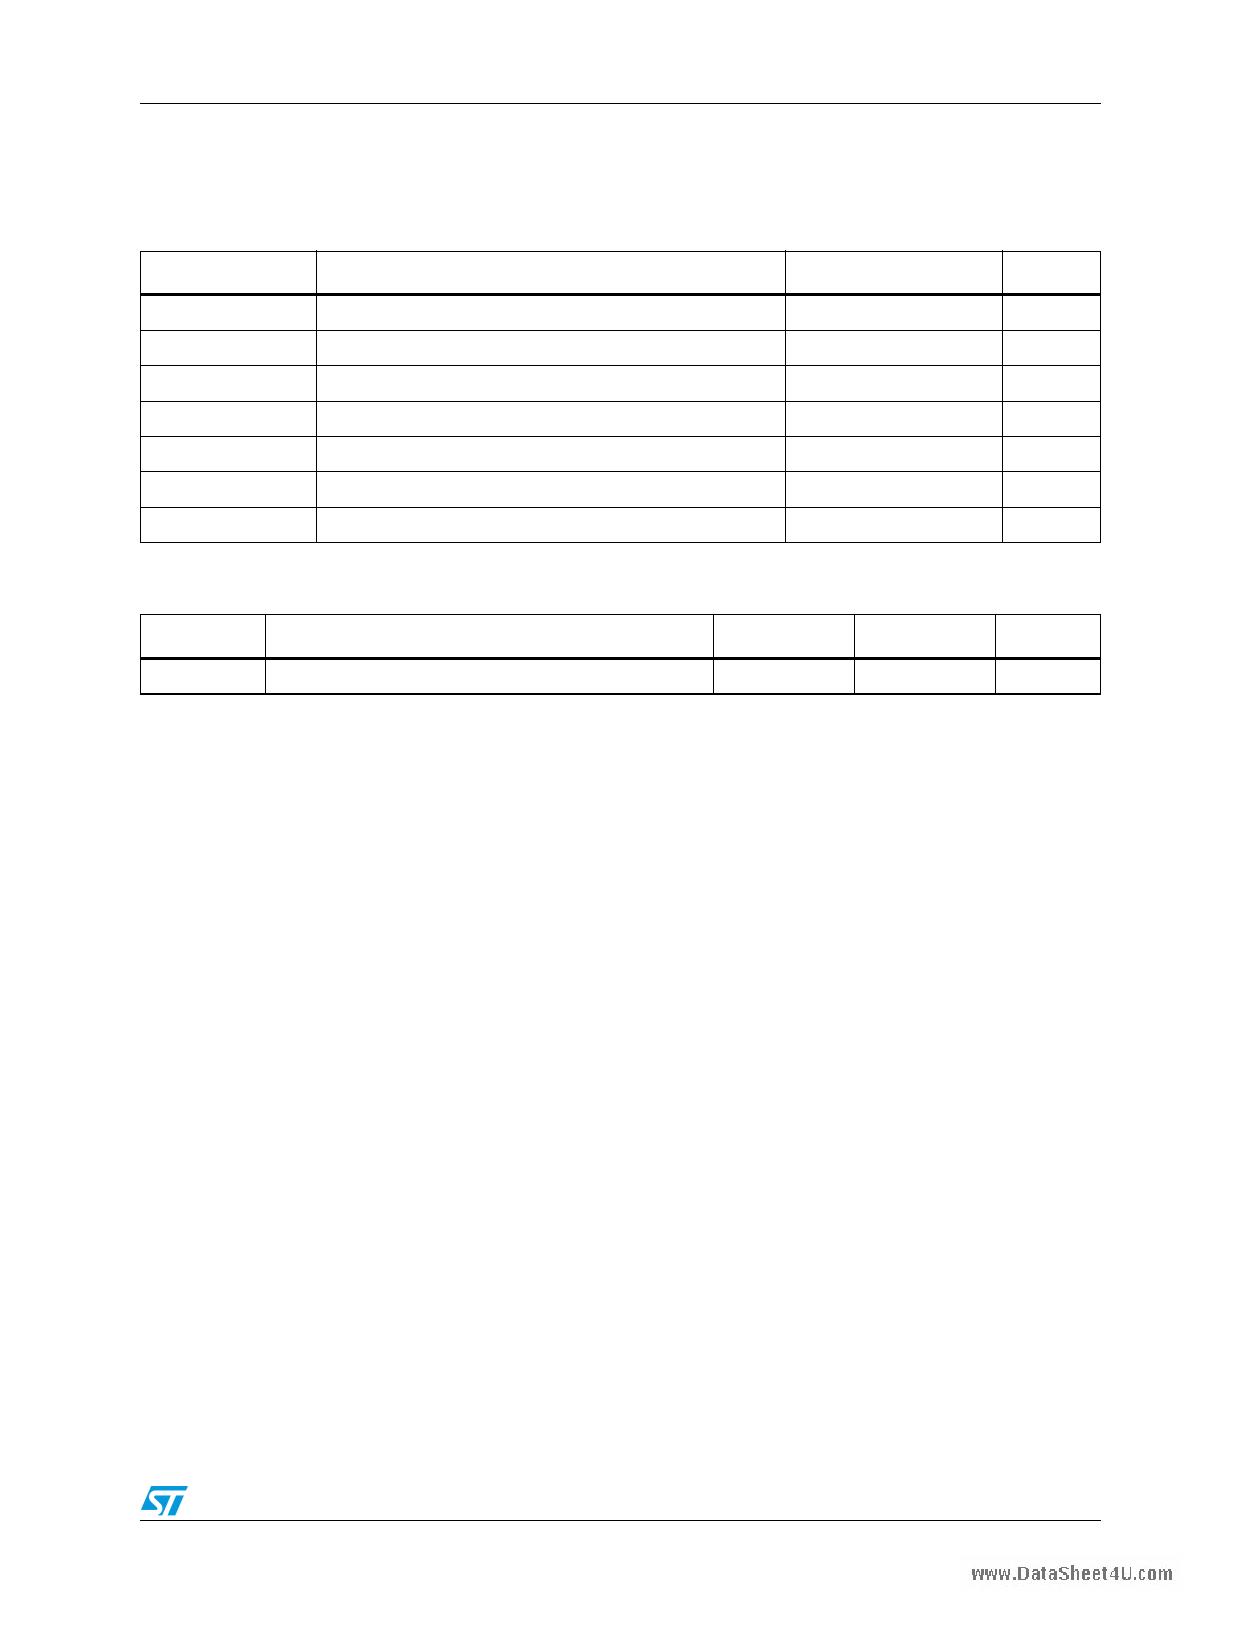 E-ULN200xD1 pdf